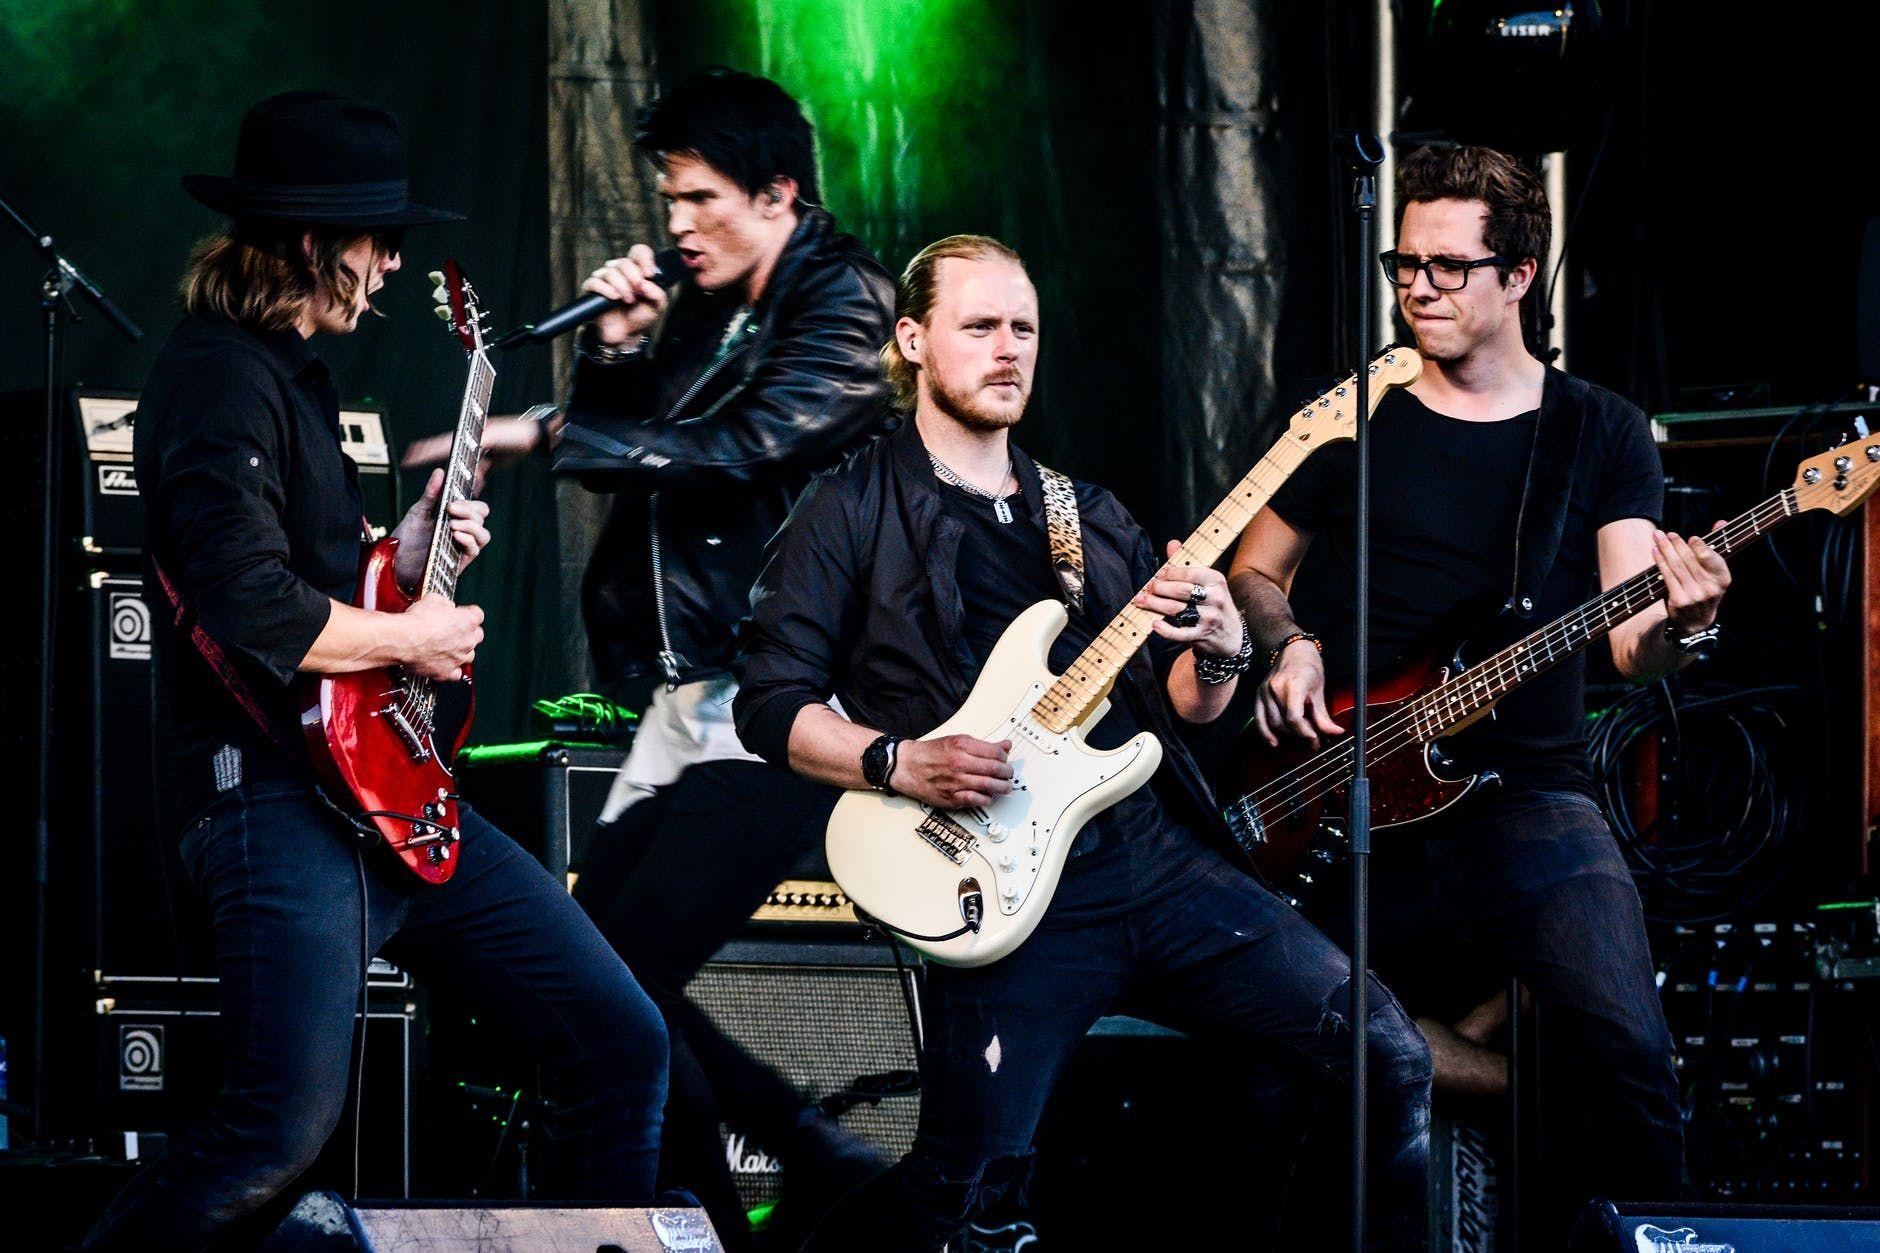 Membros de uma banda de rock tocando ao vivo